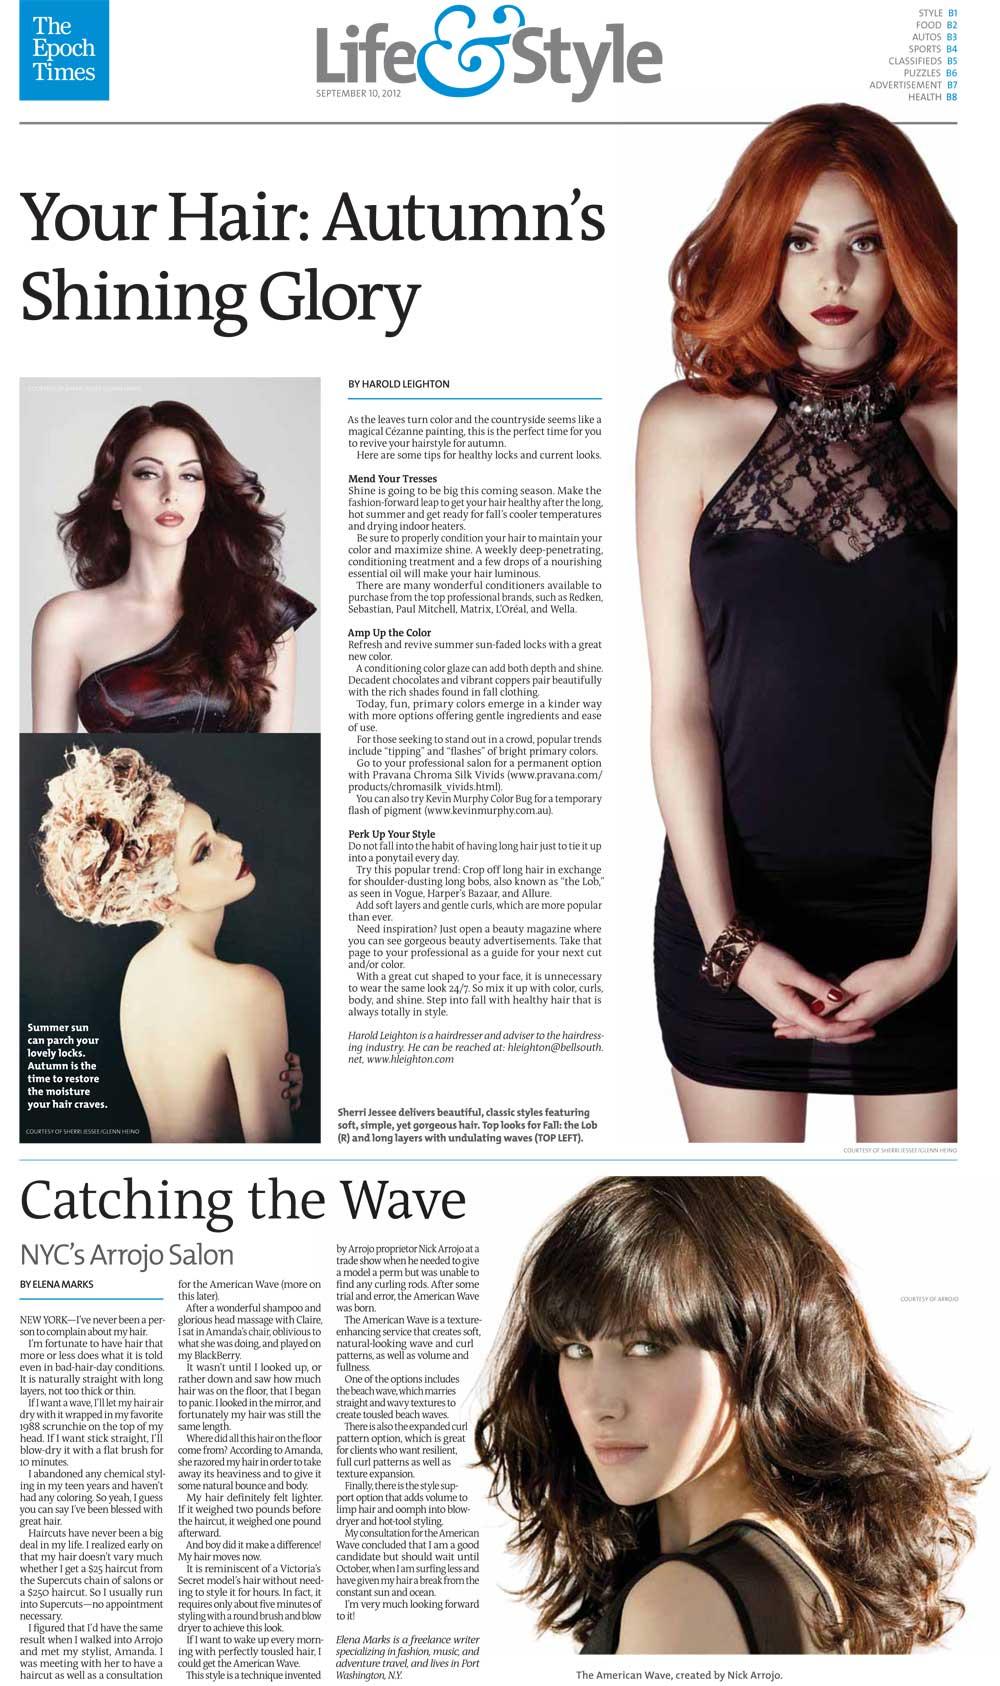 The-Epoch-Times-Sept-10-2012.jpg